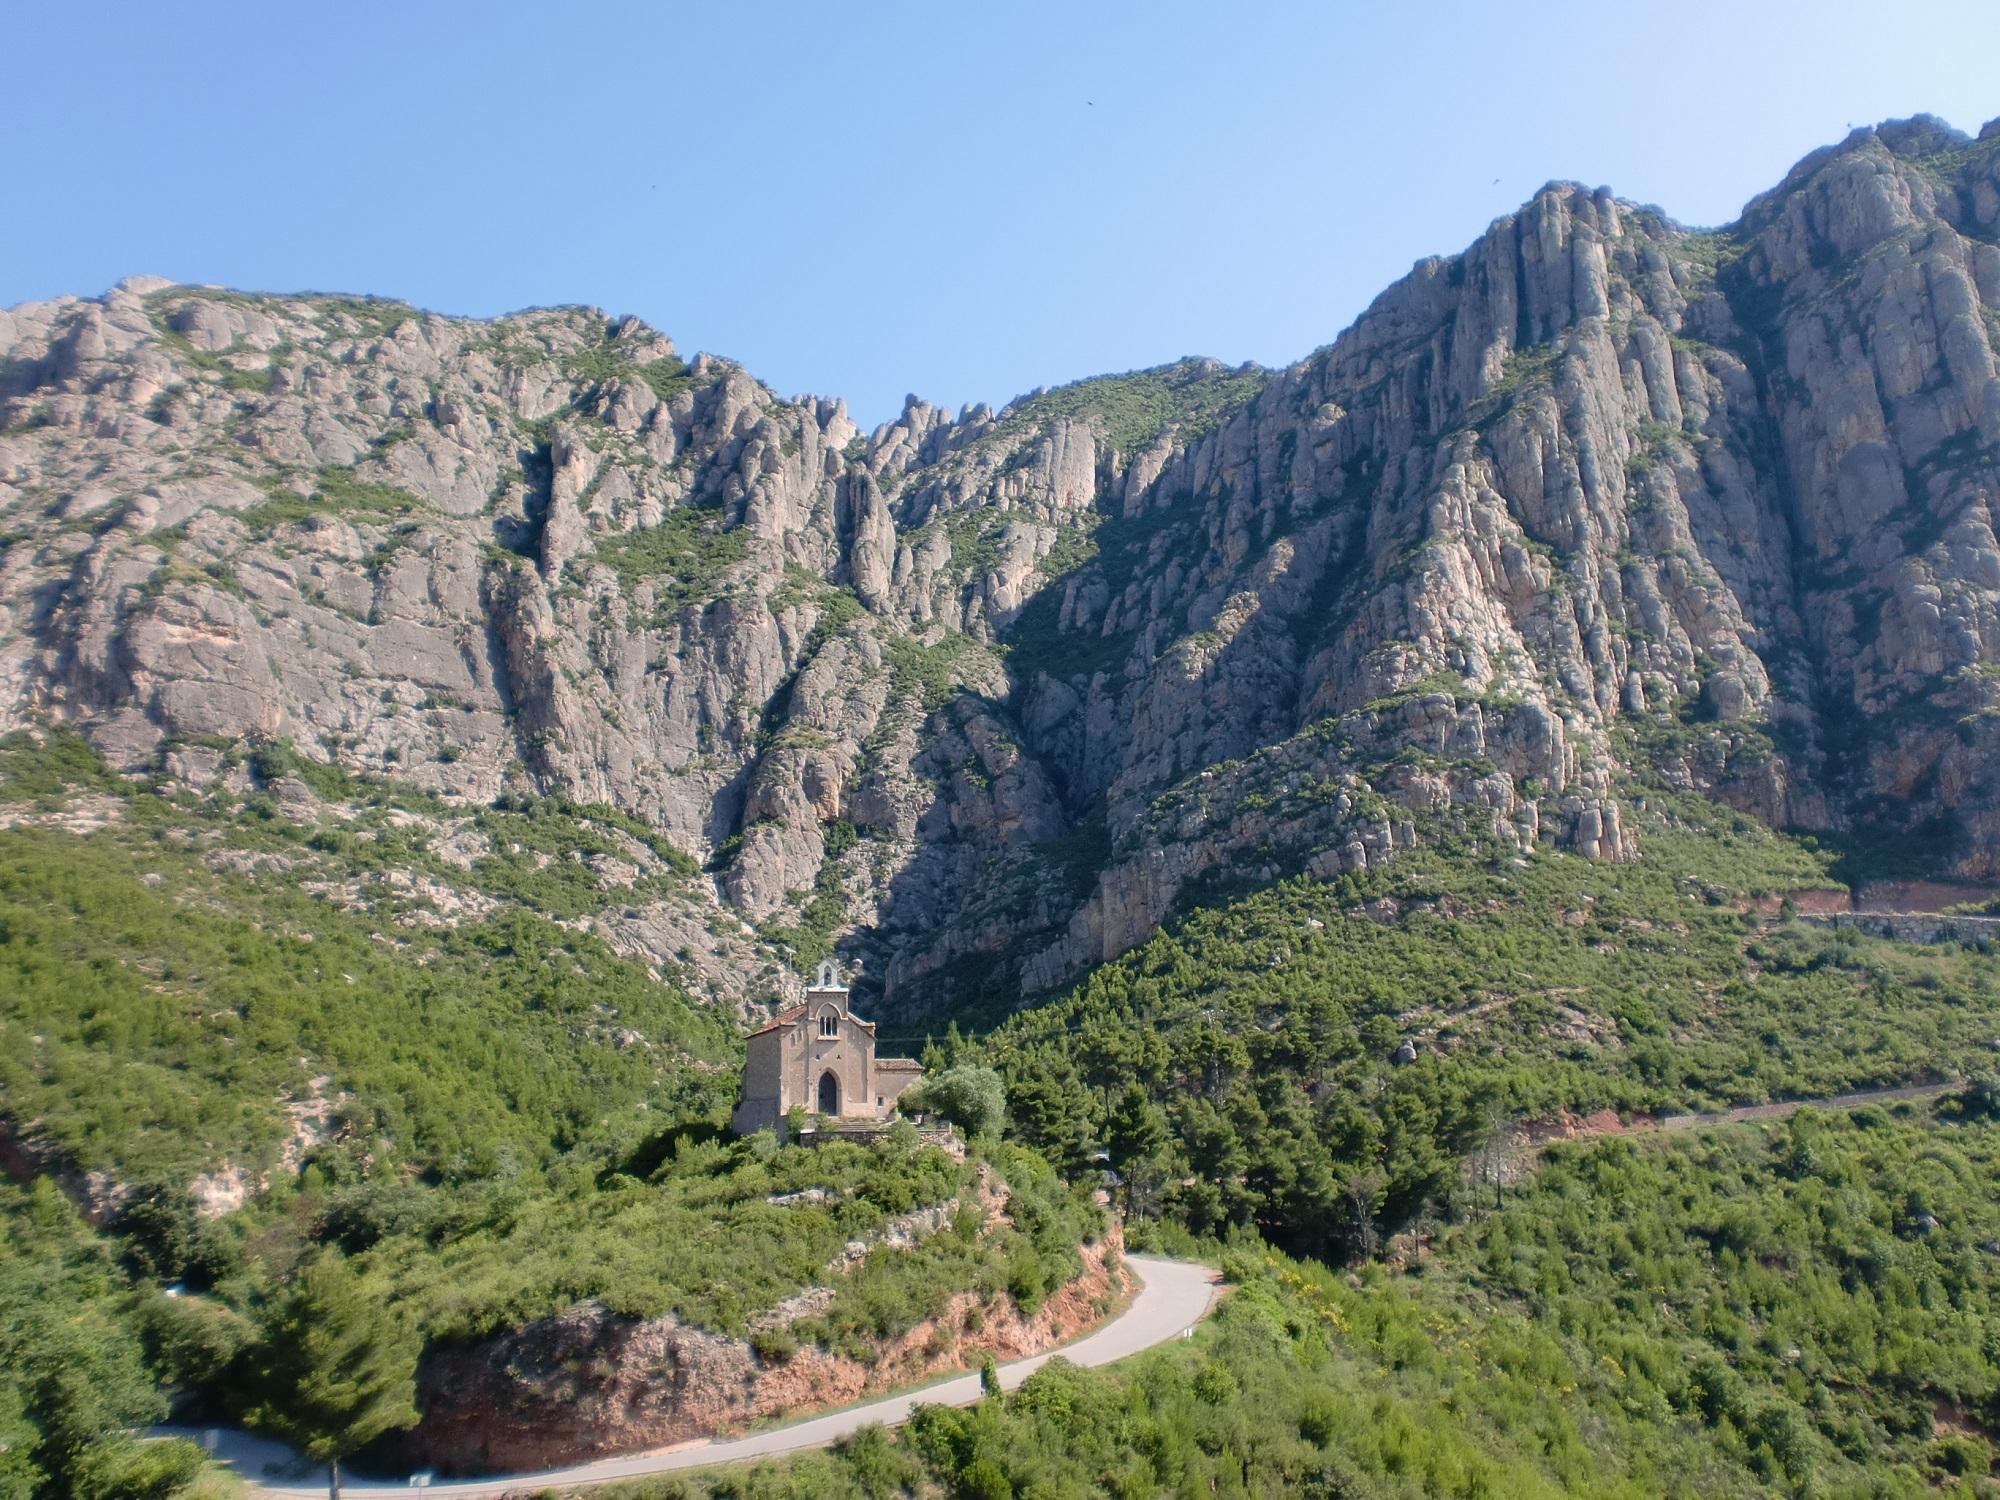 Conoceréis el oleoturismo con esta visita al Baix Llobregat